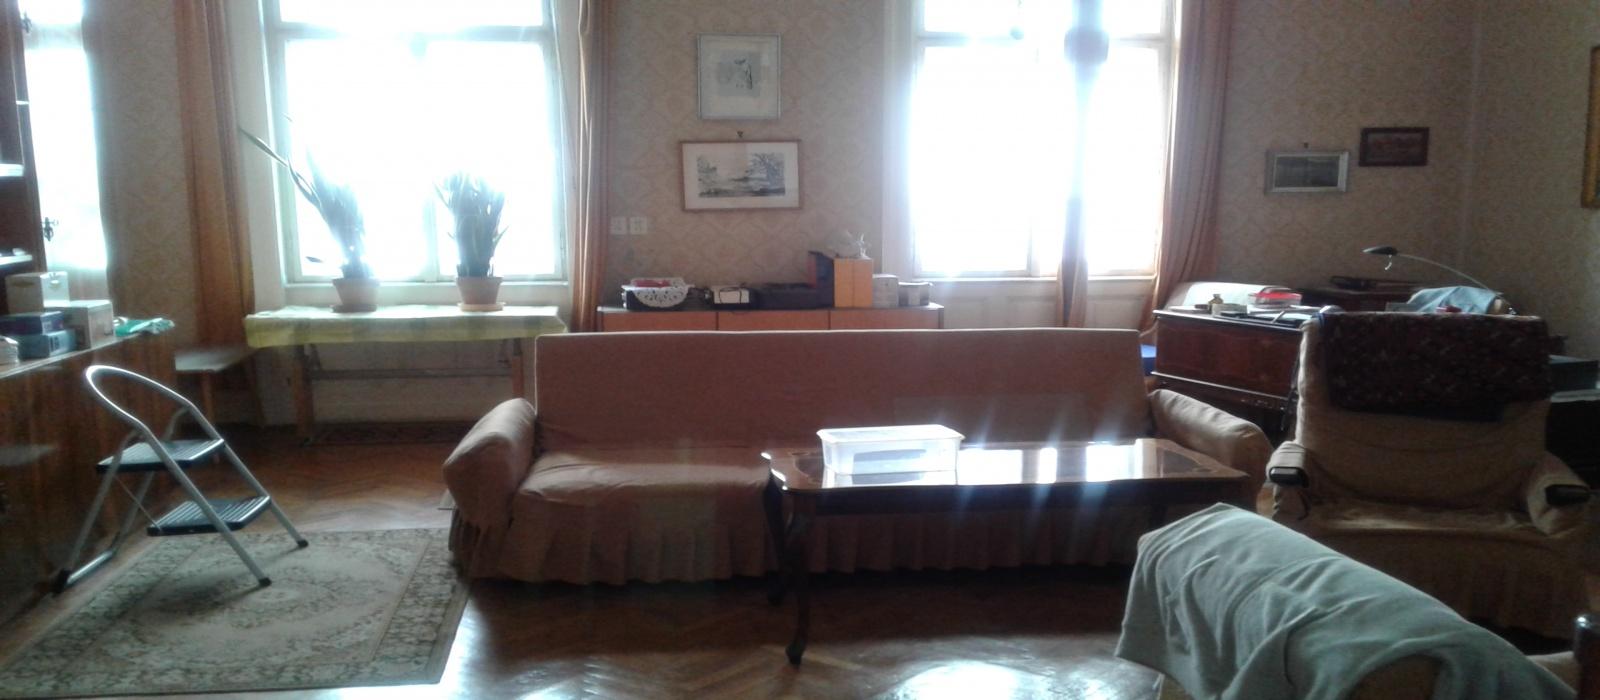 10 Petöfi Sándor street,Hungary,Hungary,1 Bedroom Bedrooms,1 BathroomBathrooms,Apartment,Petöfi Sándor street,4,1142